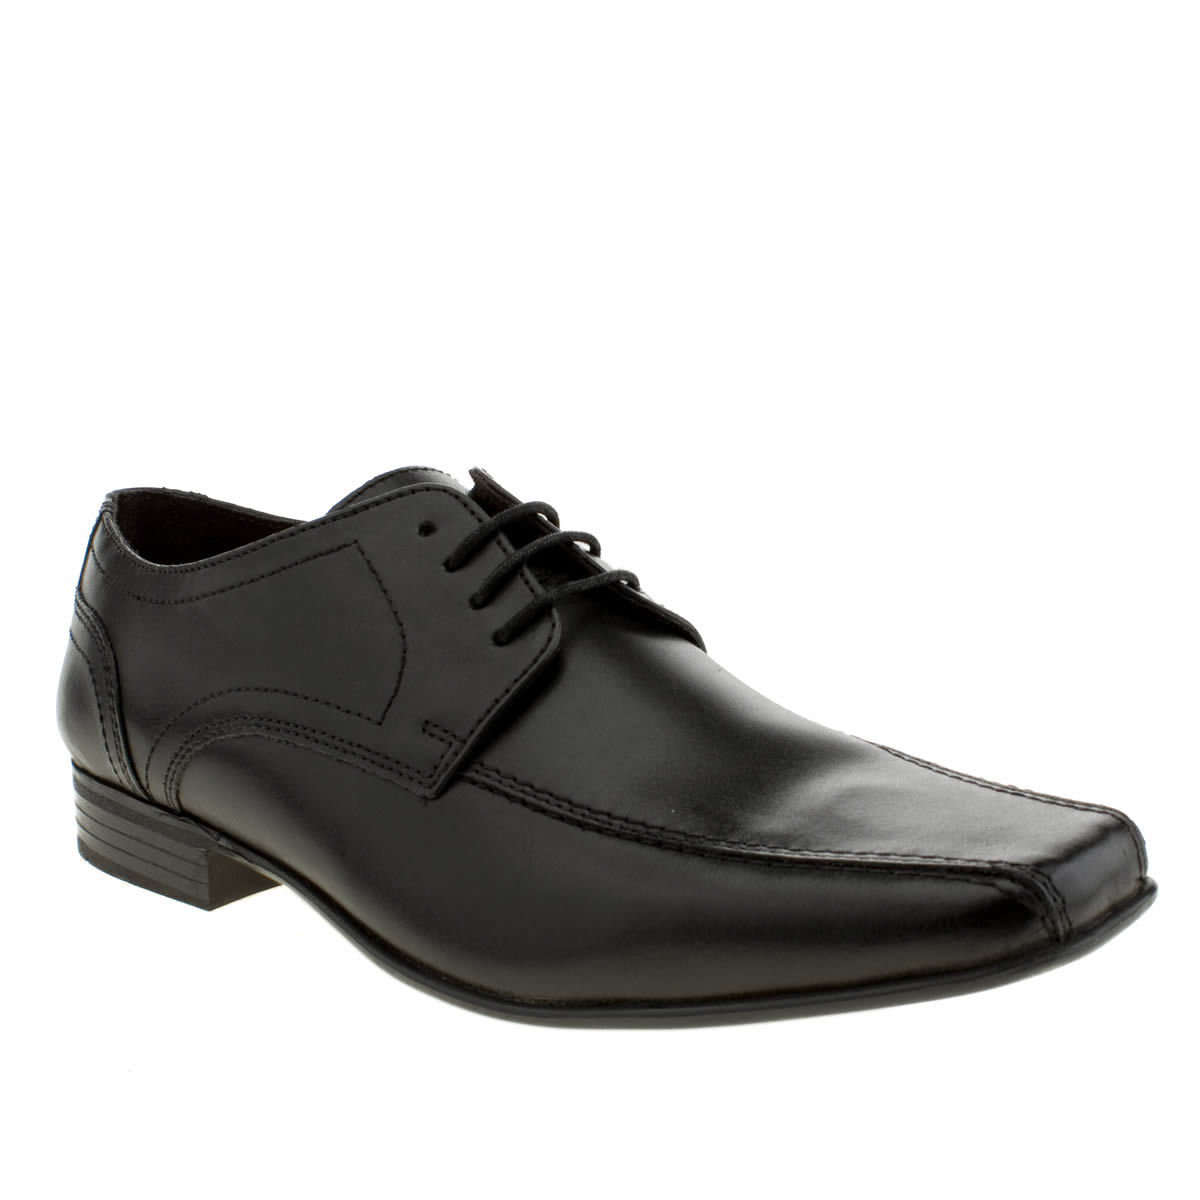 Ikon Ikon Black English Tram Gibson Shoes